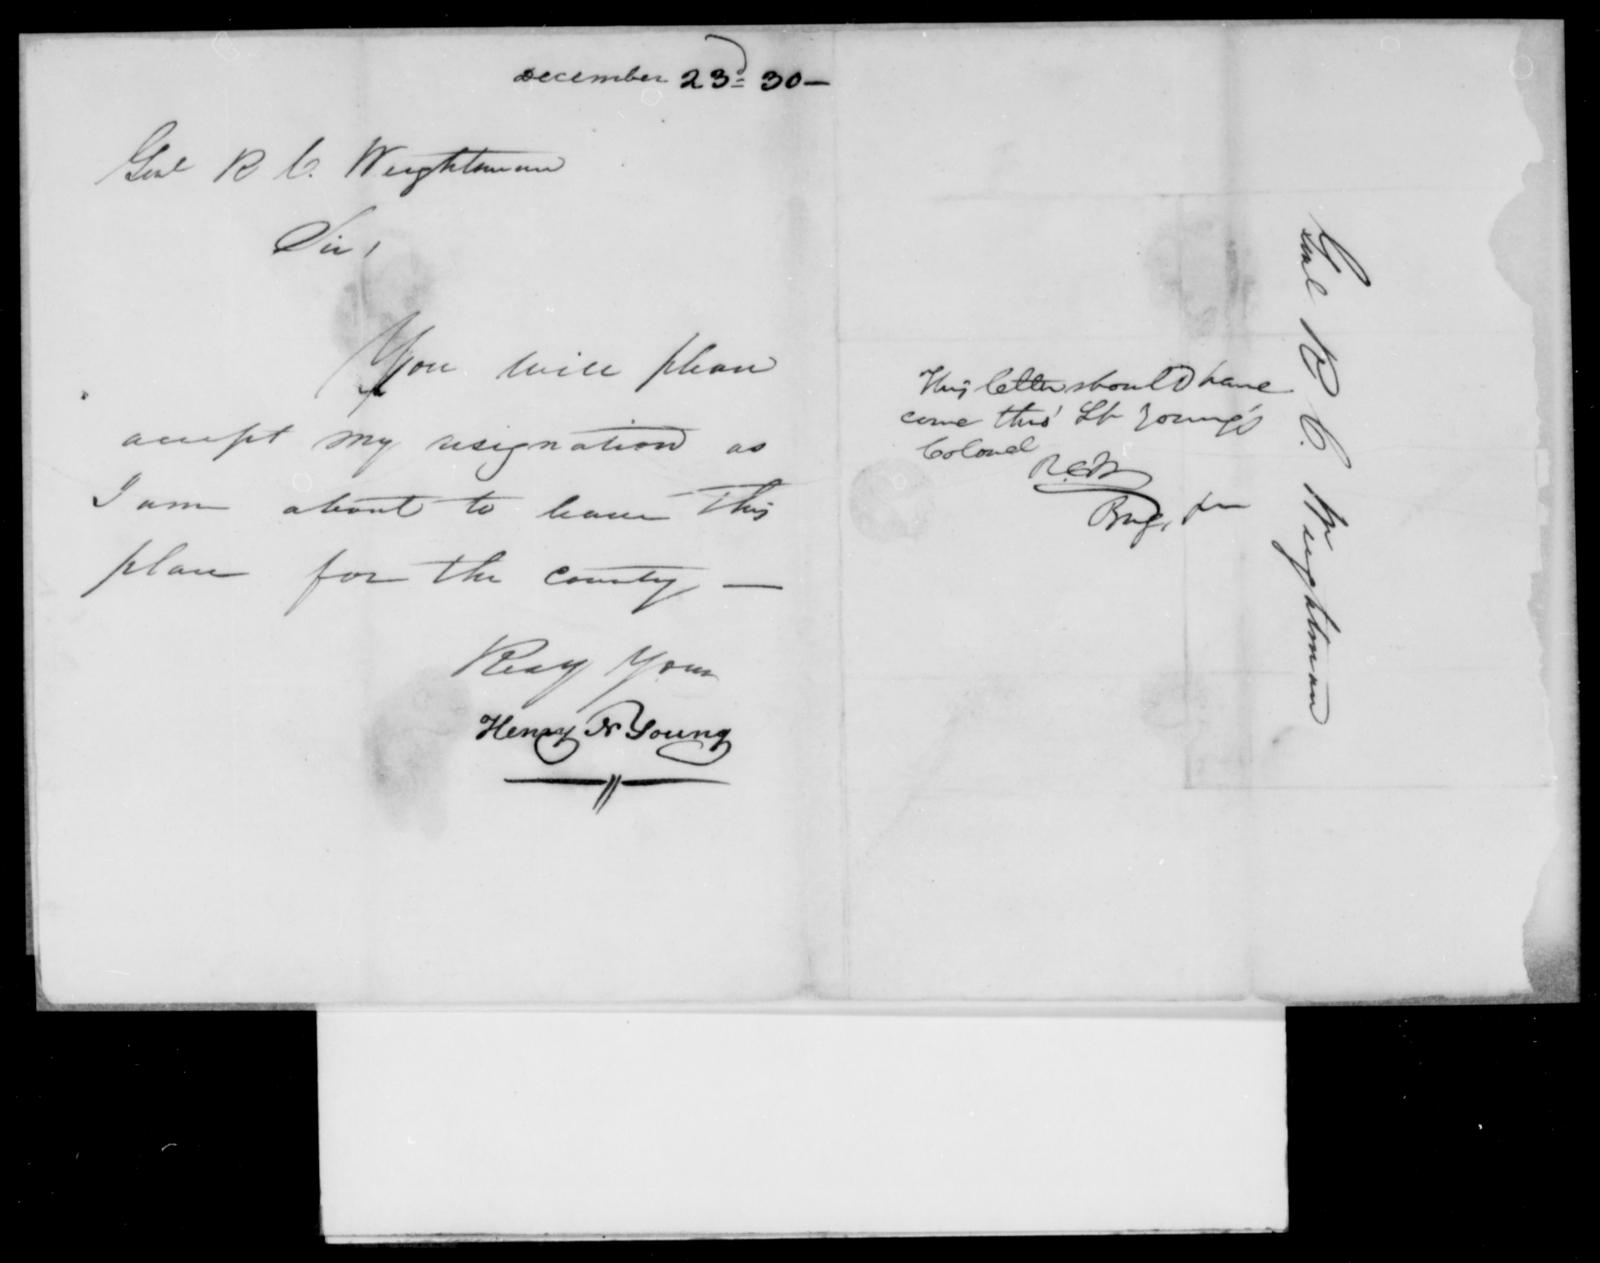 [Blank], [Blank] - State: [Blank] - Year: 1830 - File Number: [Blank]